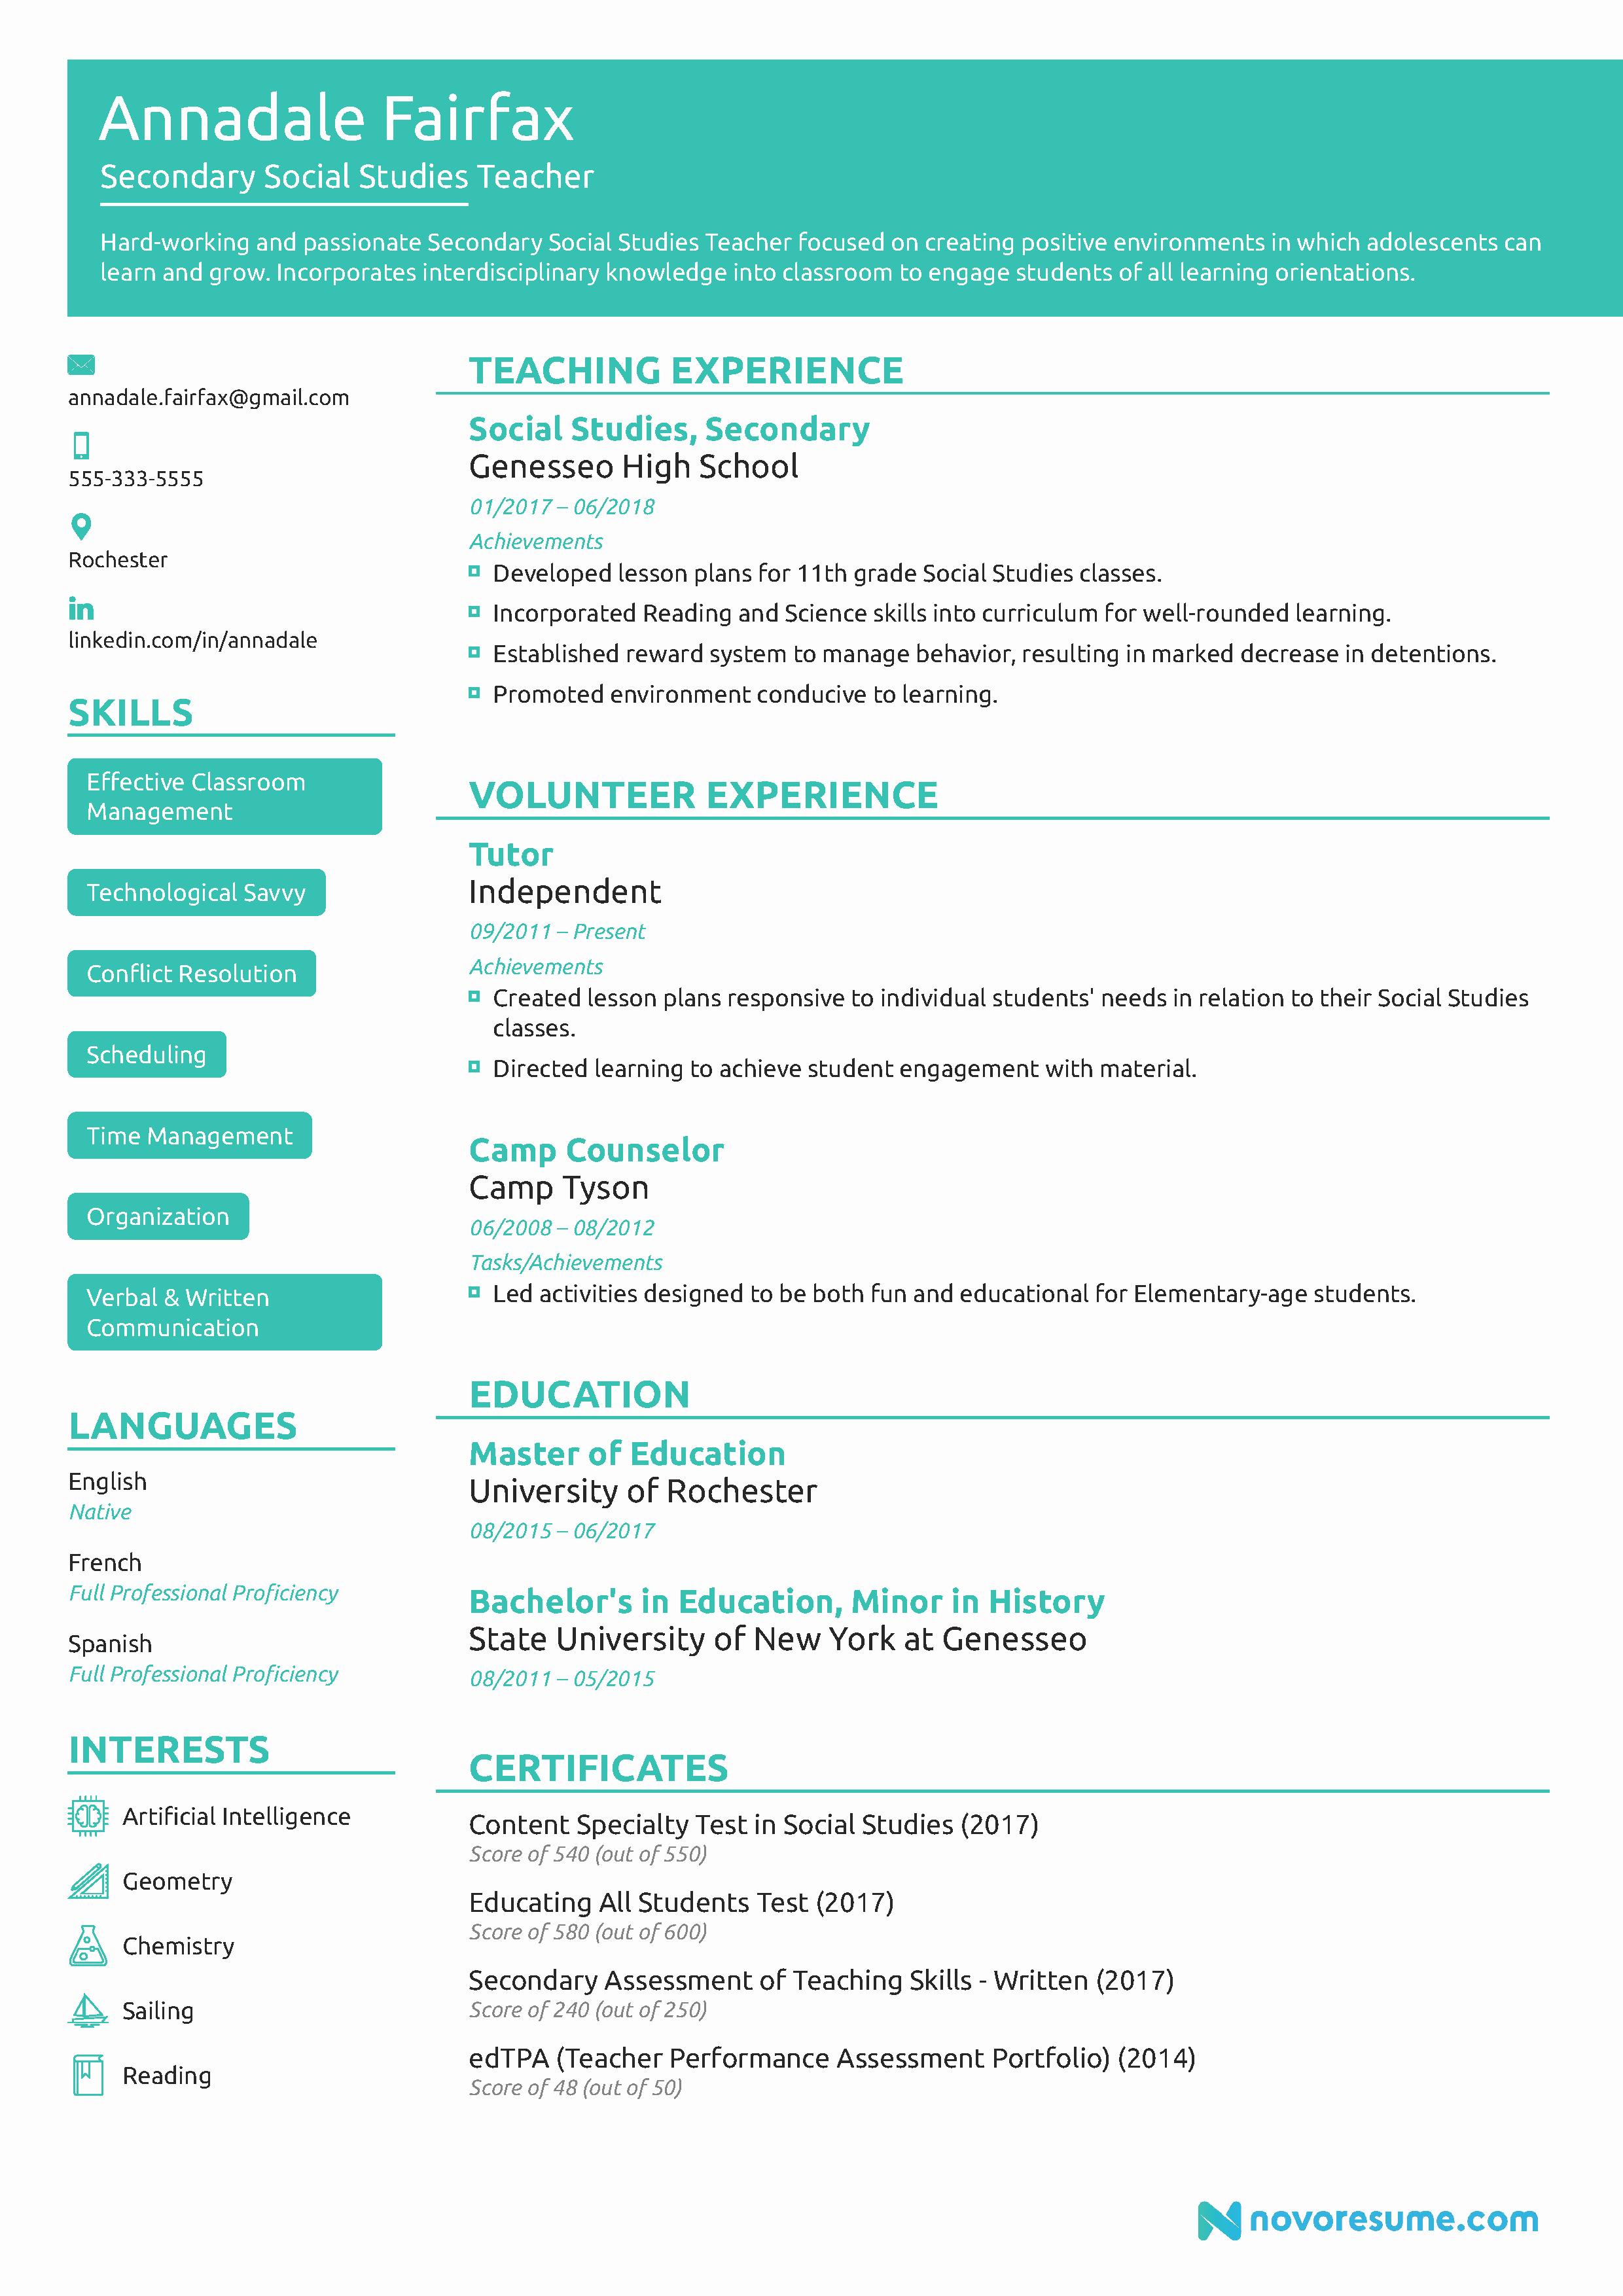 Teacher Resume Template Word Fresh Teacher Resume Example [2019] Guide & Example